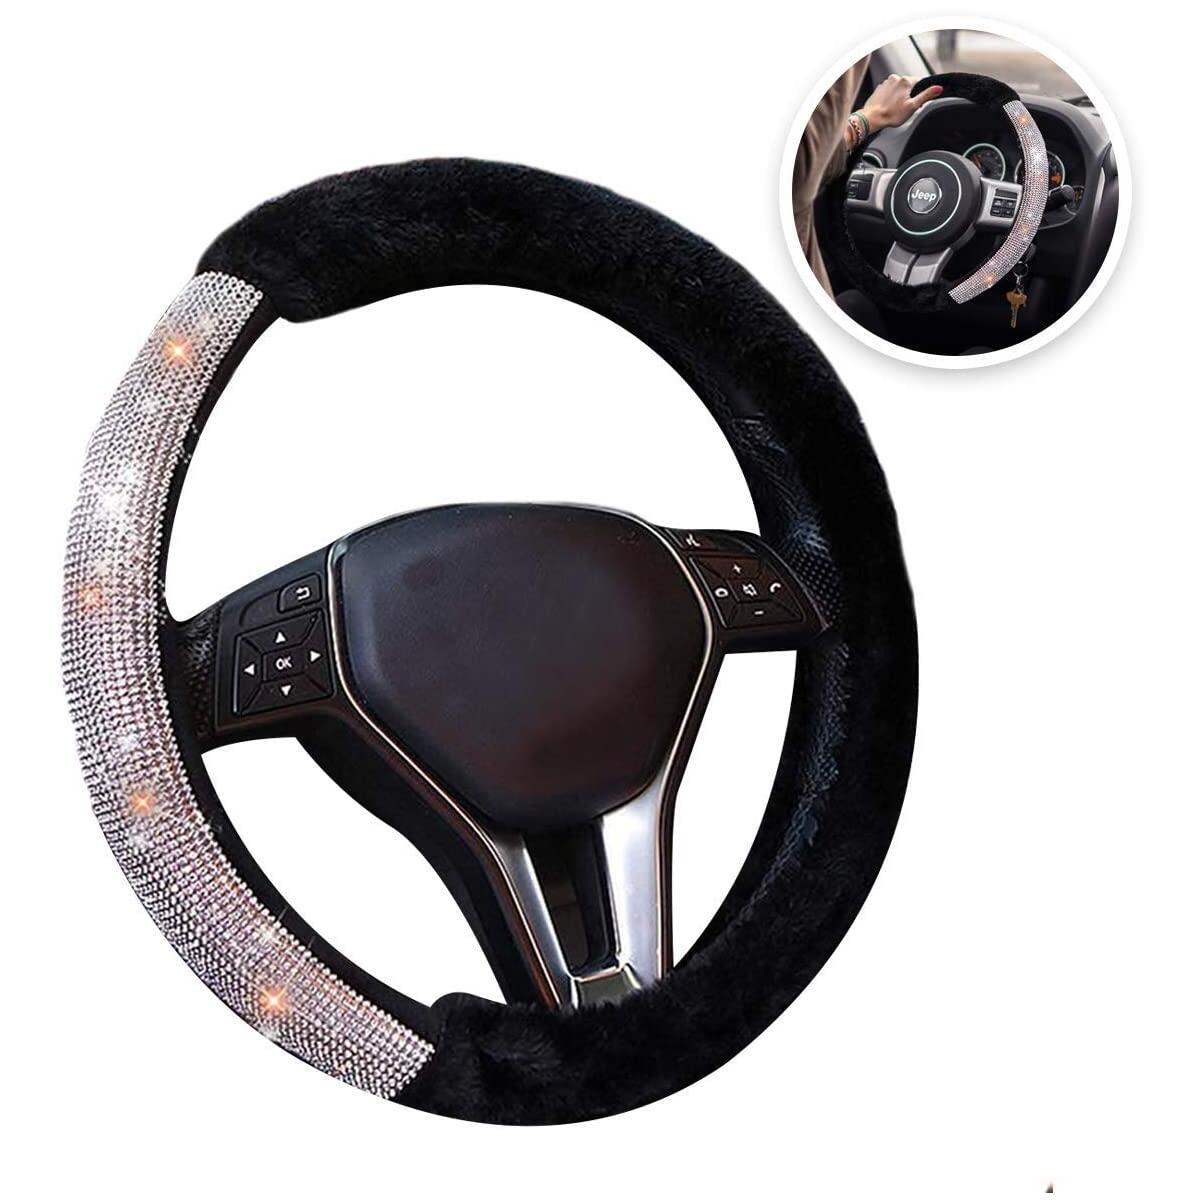 Bling and Plush Steering Wheel Cover - for Women, Diamond Bling Crystal Grade Imitation Cashmere Plush Texture, Premium Quality Wheel Cover, Anti-Slip, Zento Deals.